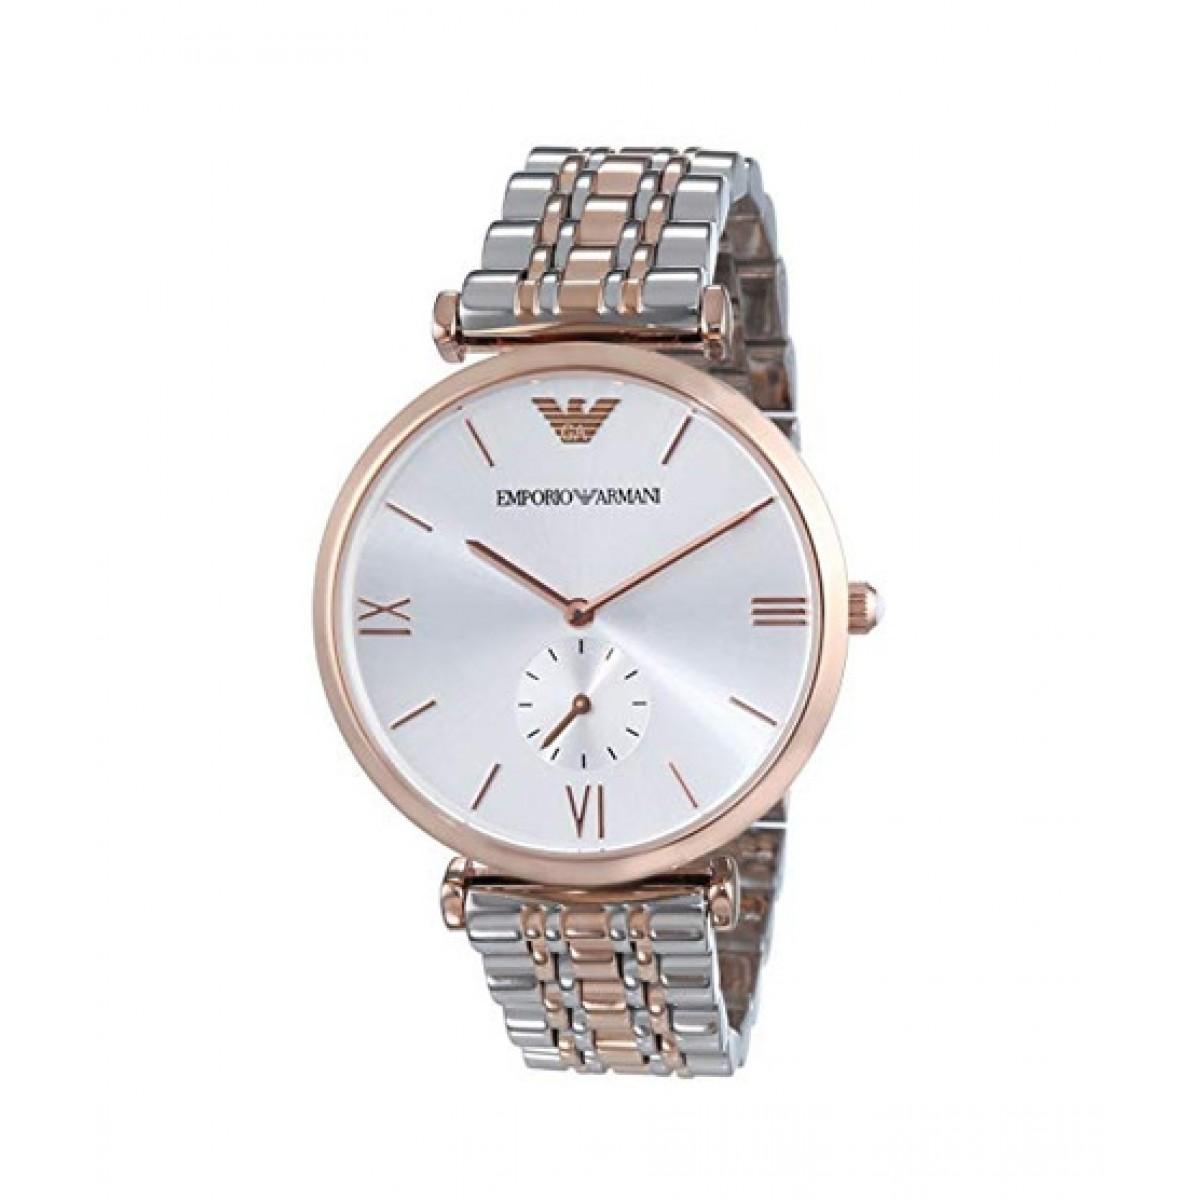 6f724a2f62 Emporio Armani Women's Watch Rose Gold (AR1677)